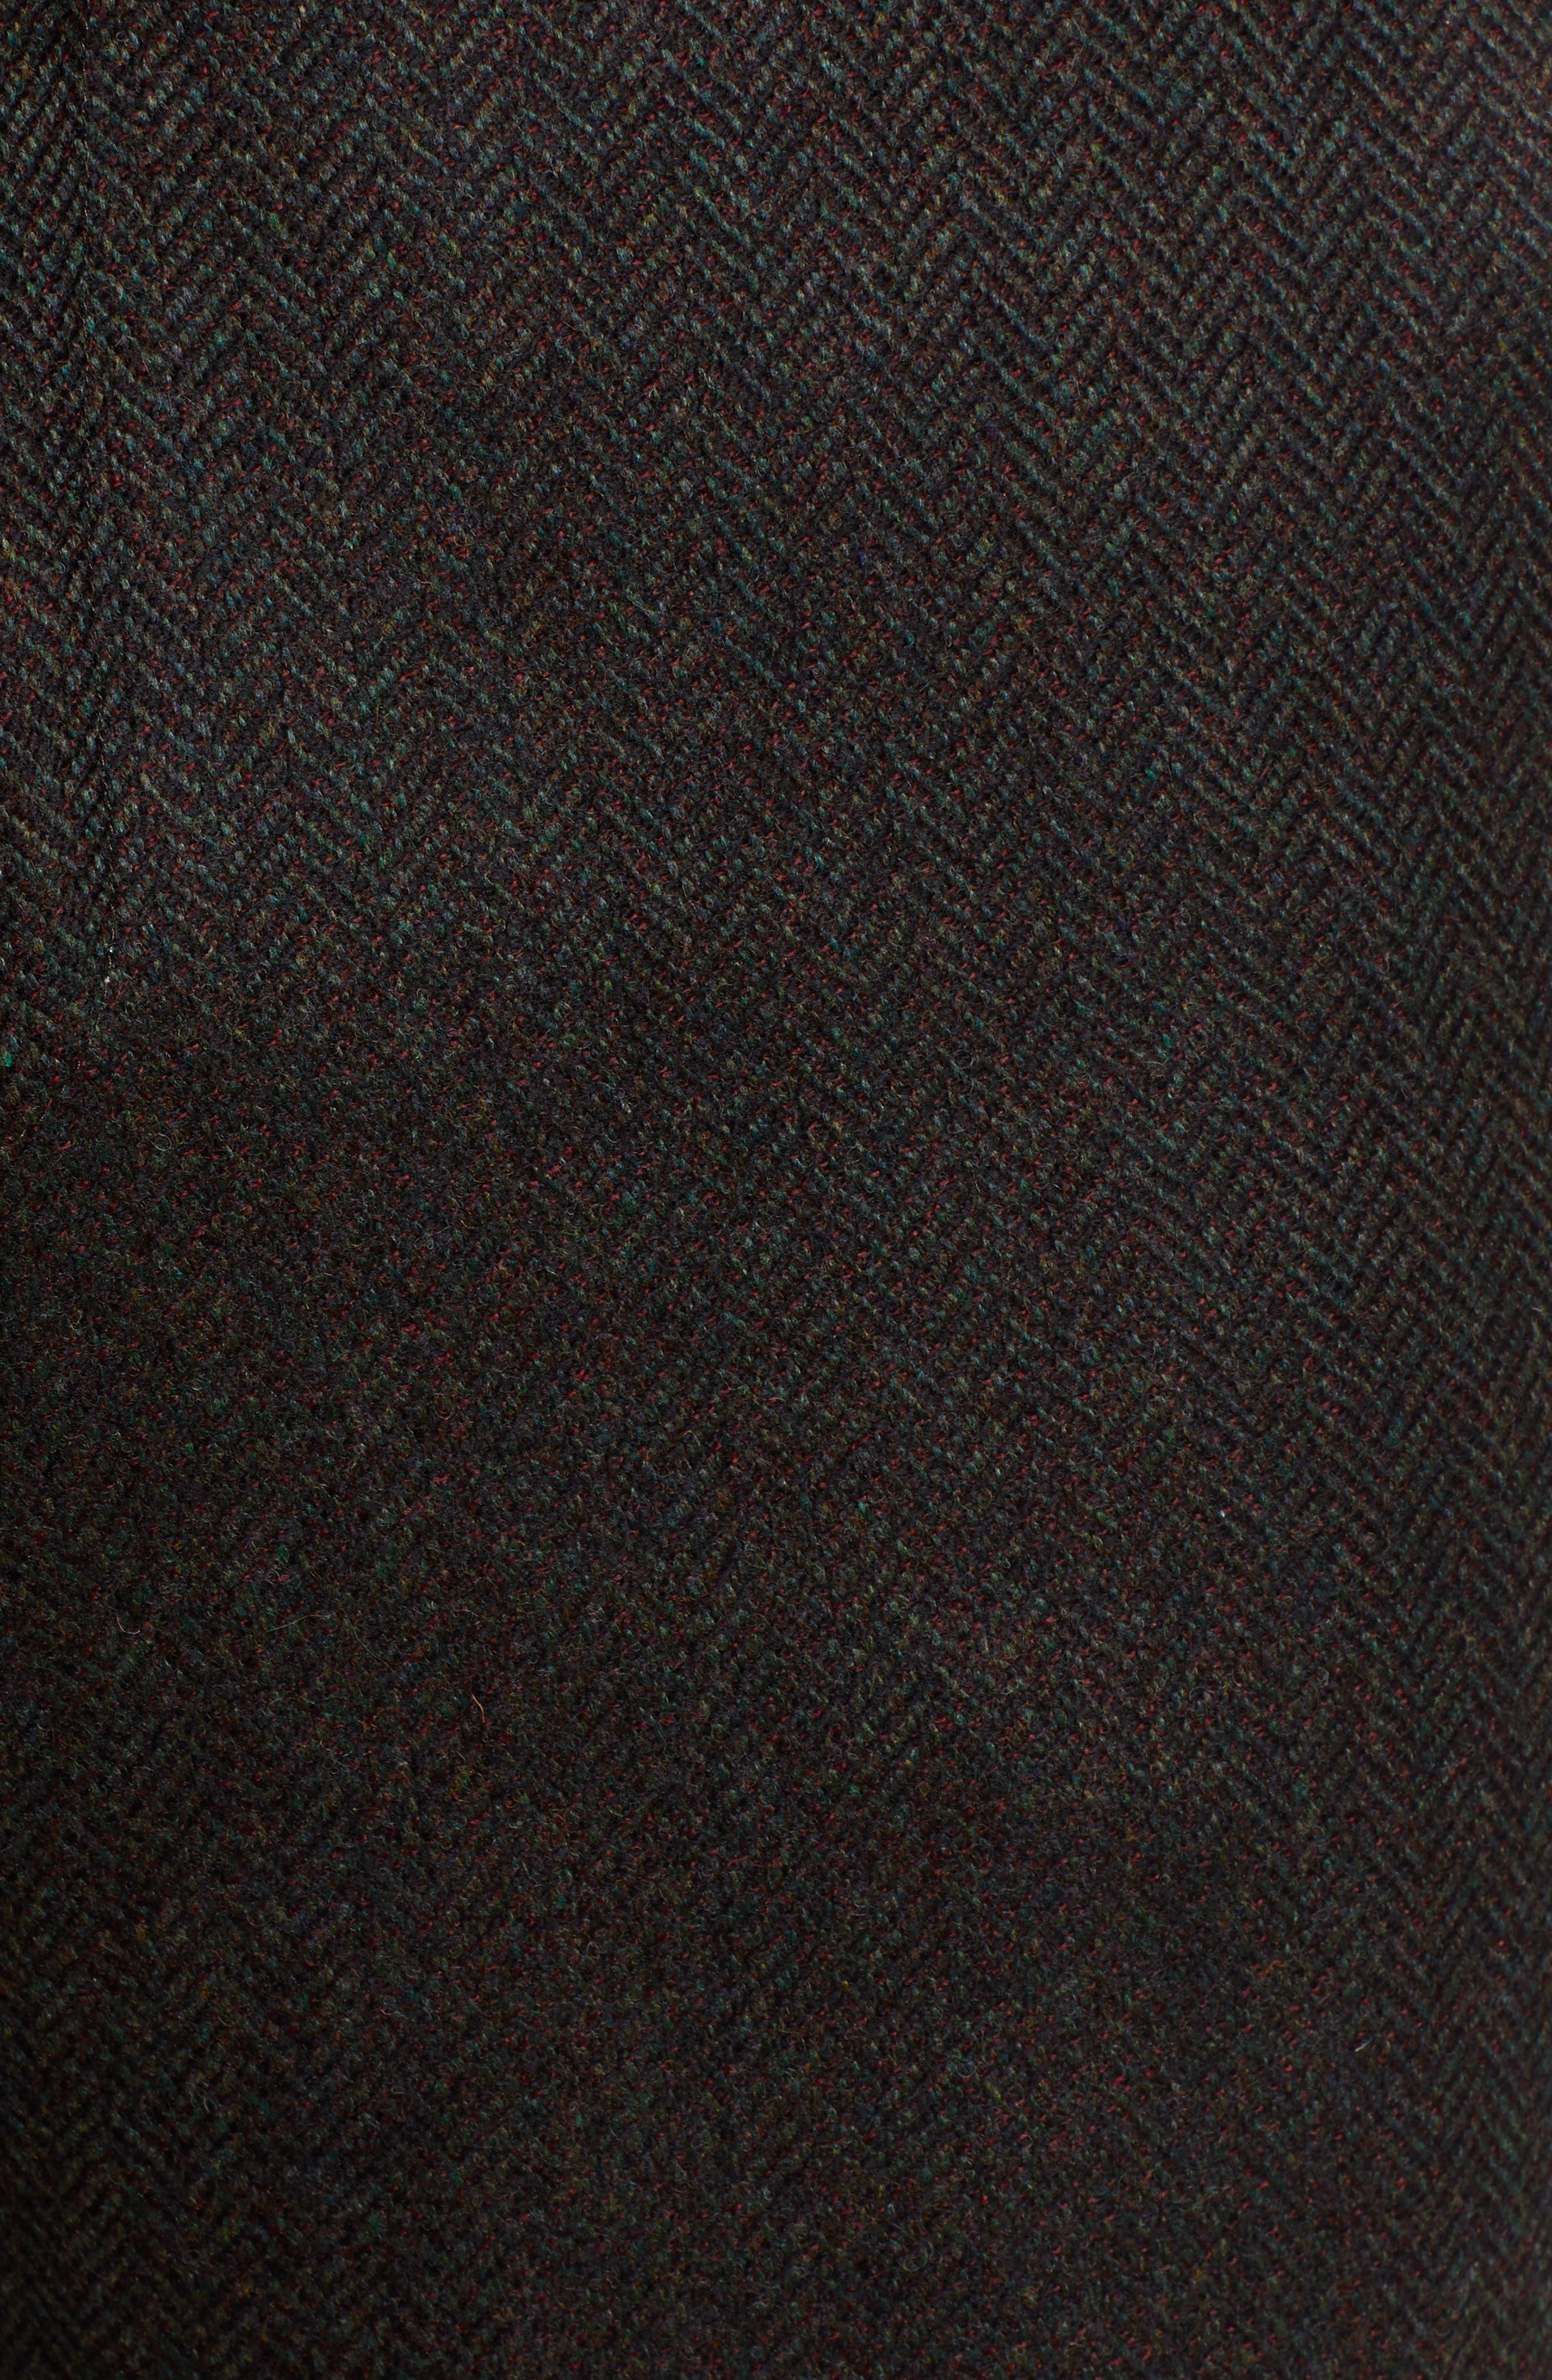 Flat Front Herringbone Wool & Cashmere Trousers,                             Alternate thumbnail 5, color,                             DARK OLIVE